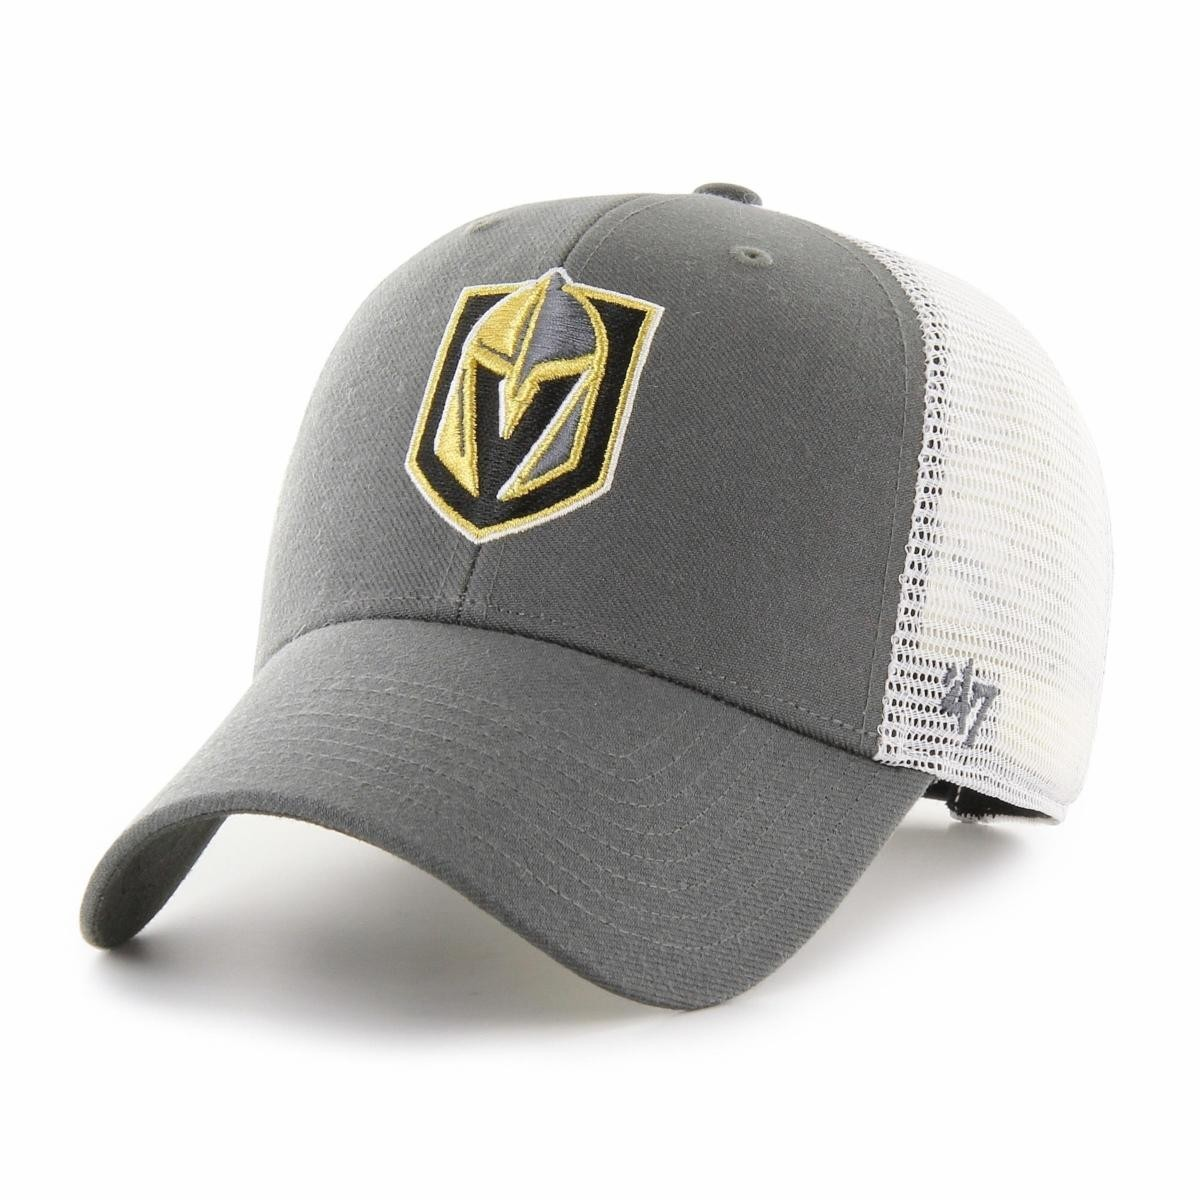 BRAND 47 Las Vegas Golden Knights Malvern MVP Adjustable Strapback Vasaras Cepure